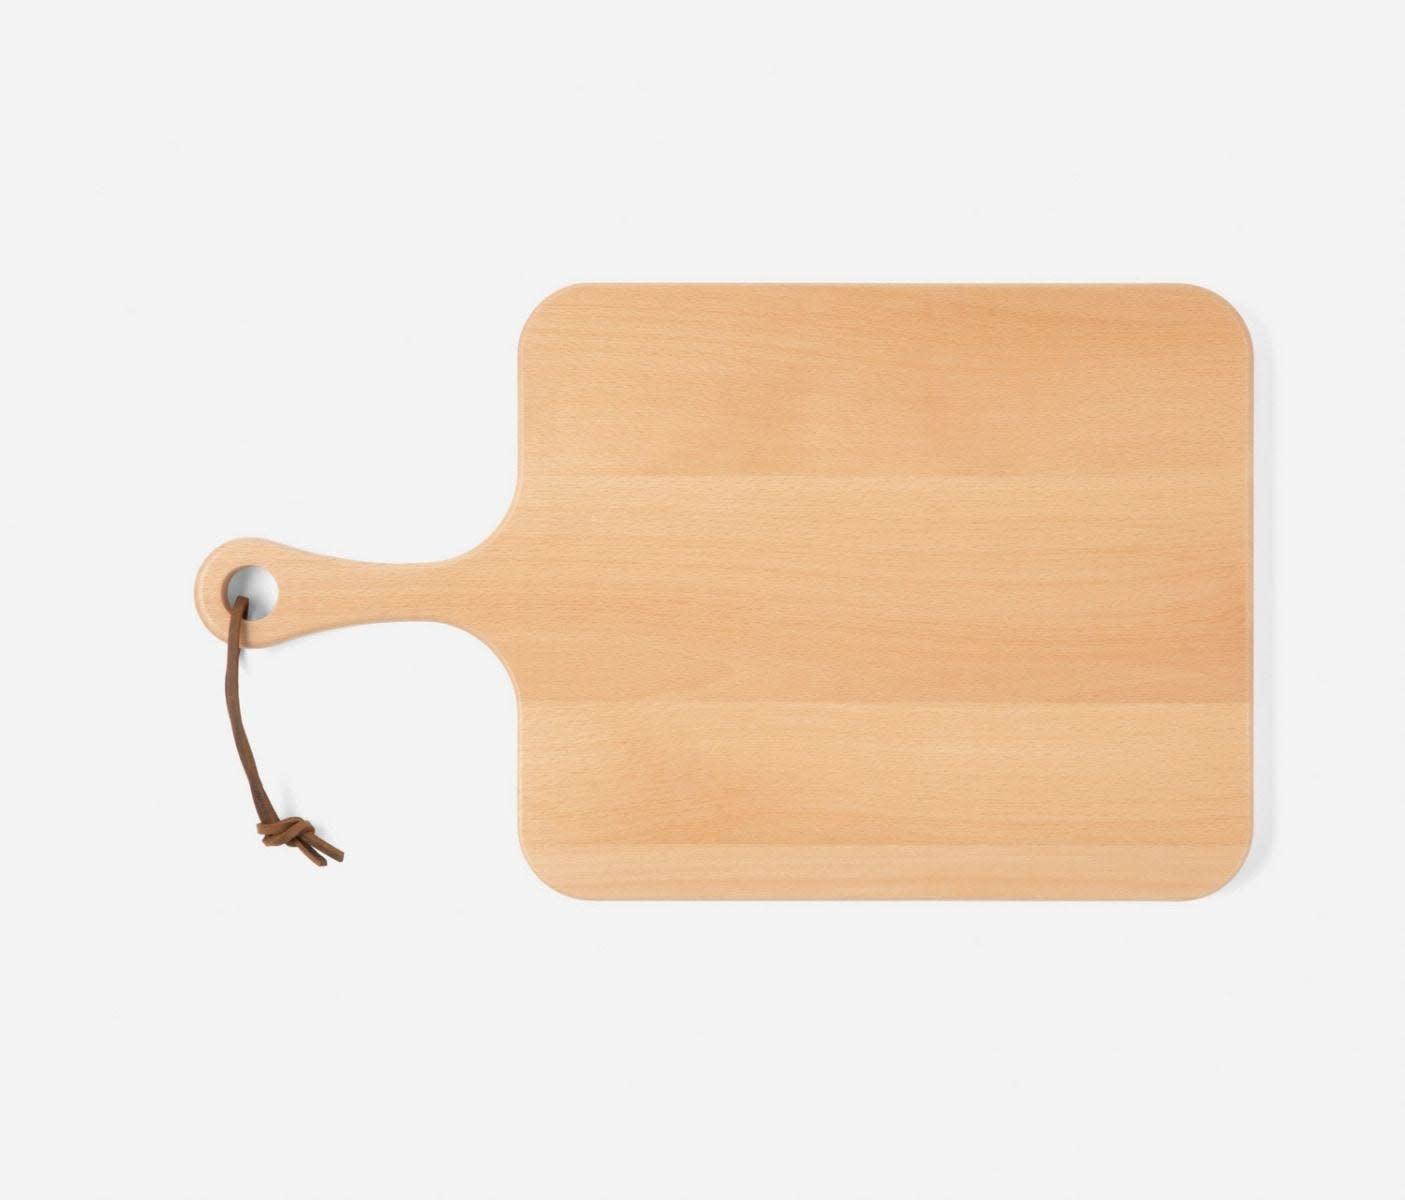 Blue Pheasant Edmund Natural Beech Wood Serving Board 22 x 13